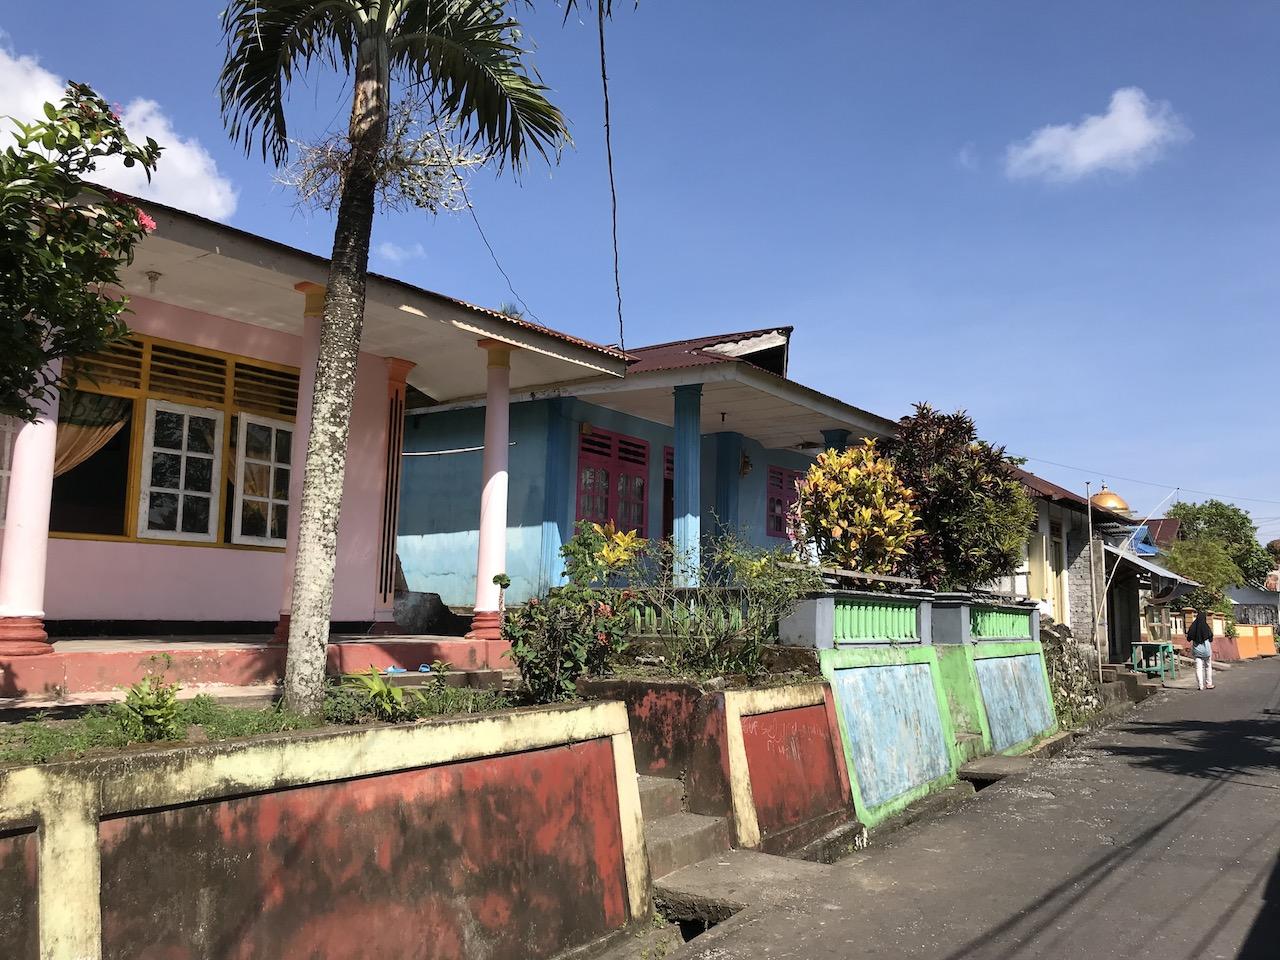 Banda-Inseln-Banda-Neira-Häuser Nusantara